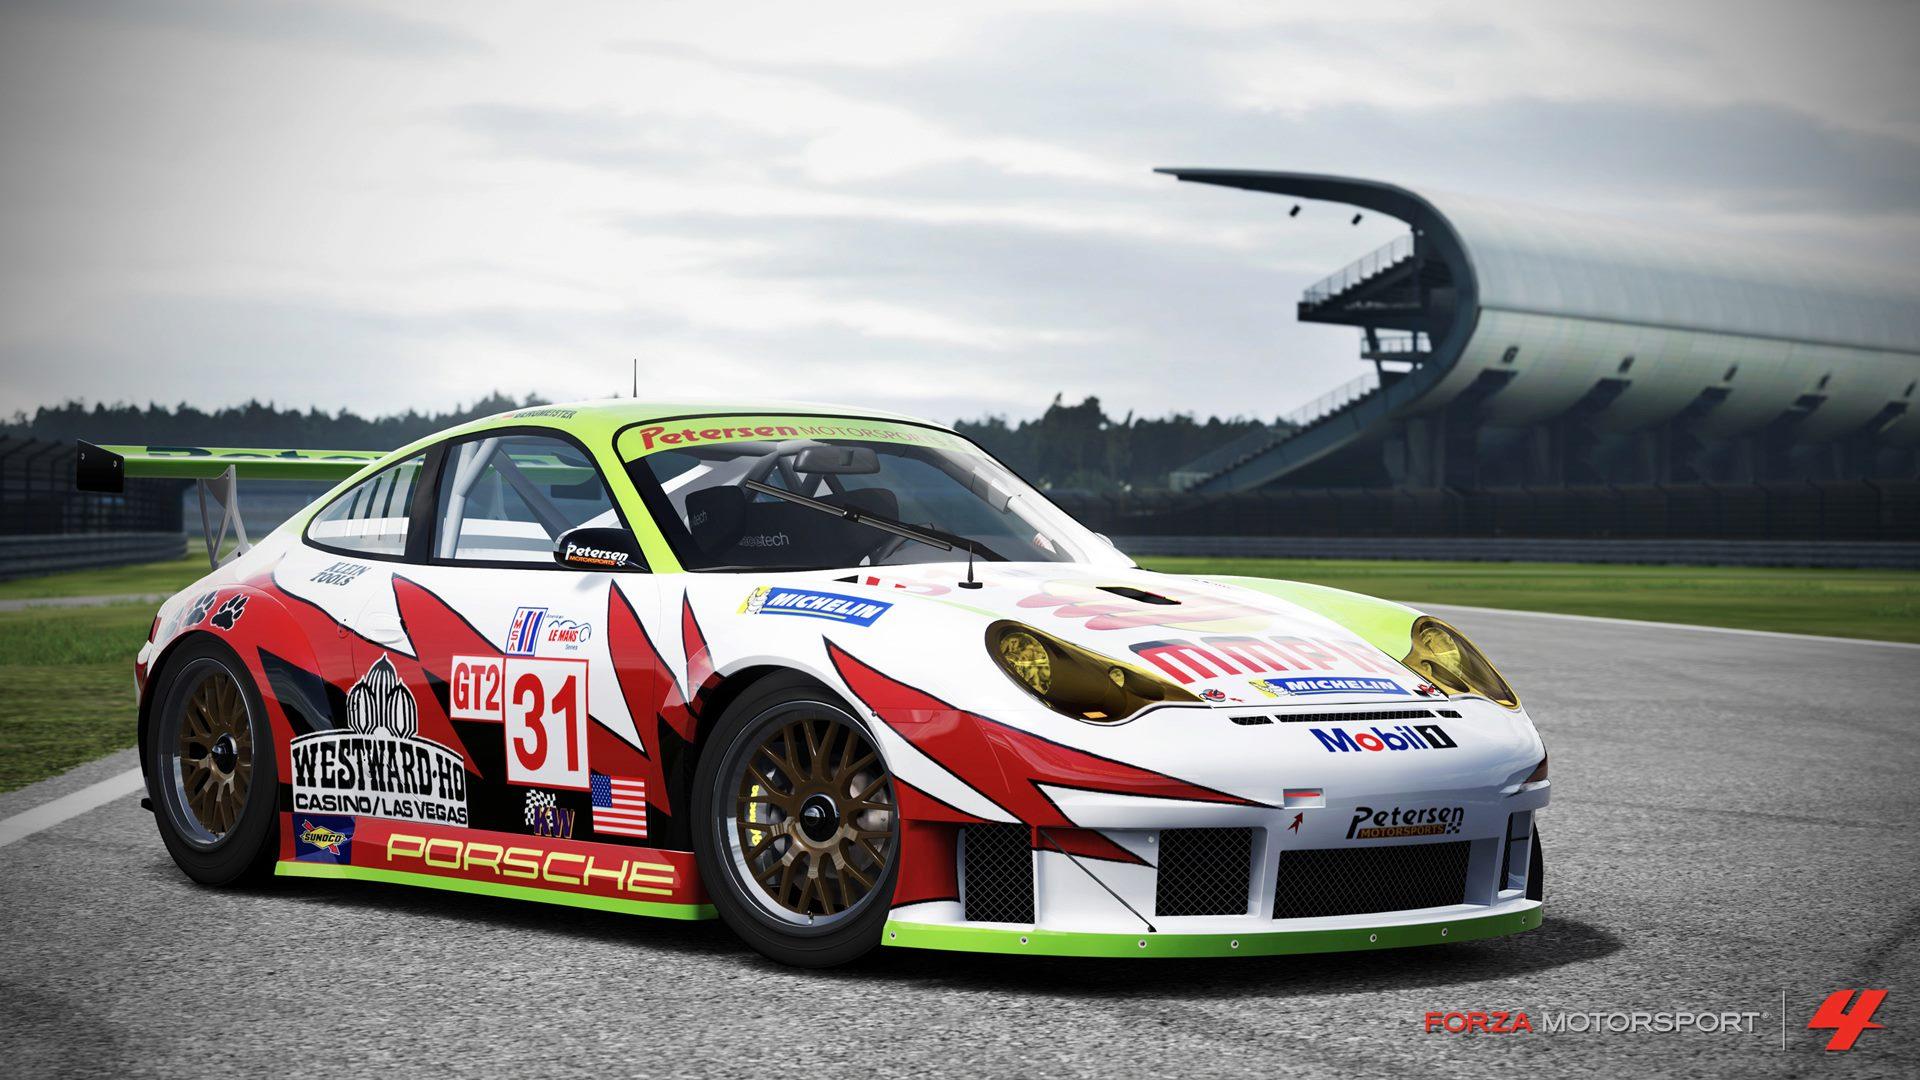 latest?cb=20170626165859 Remarkable Porsche 911 Gt2 Xbox 360 Cars Trend